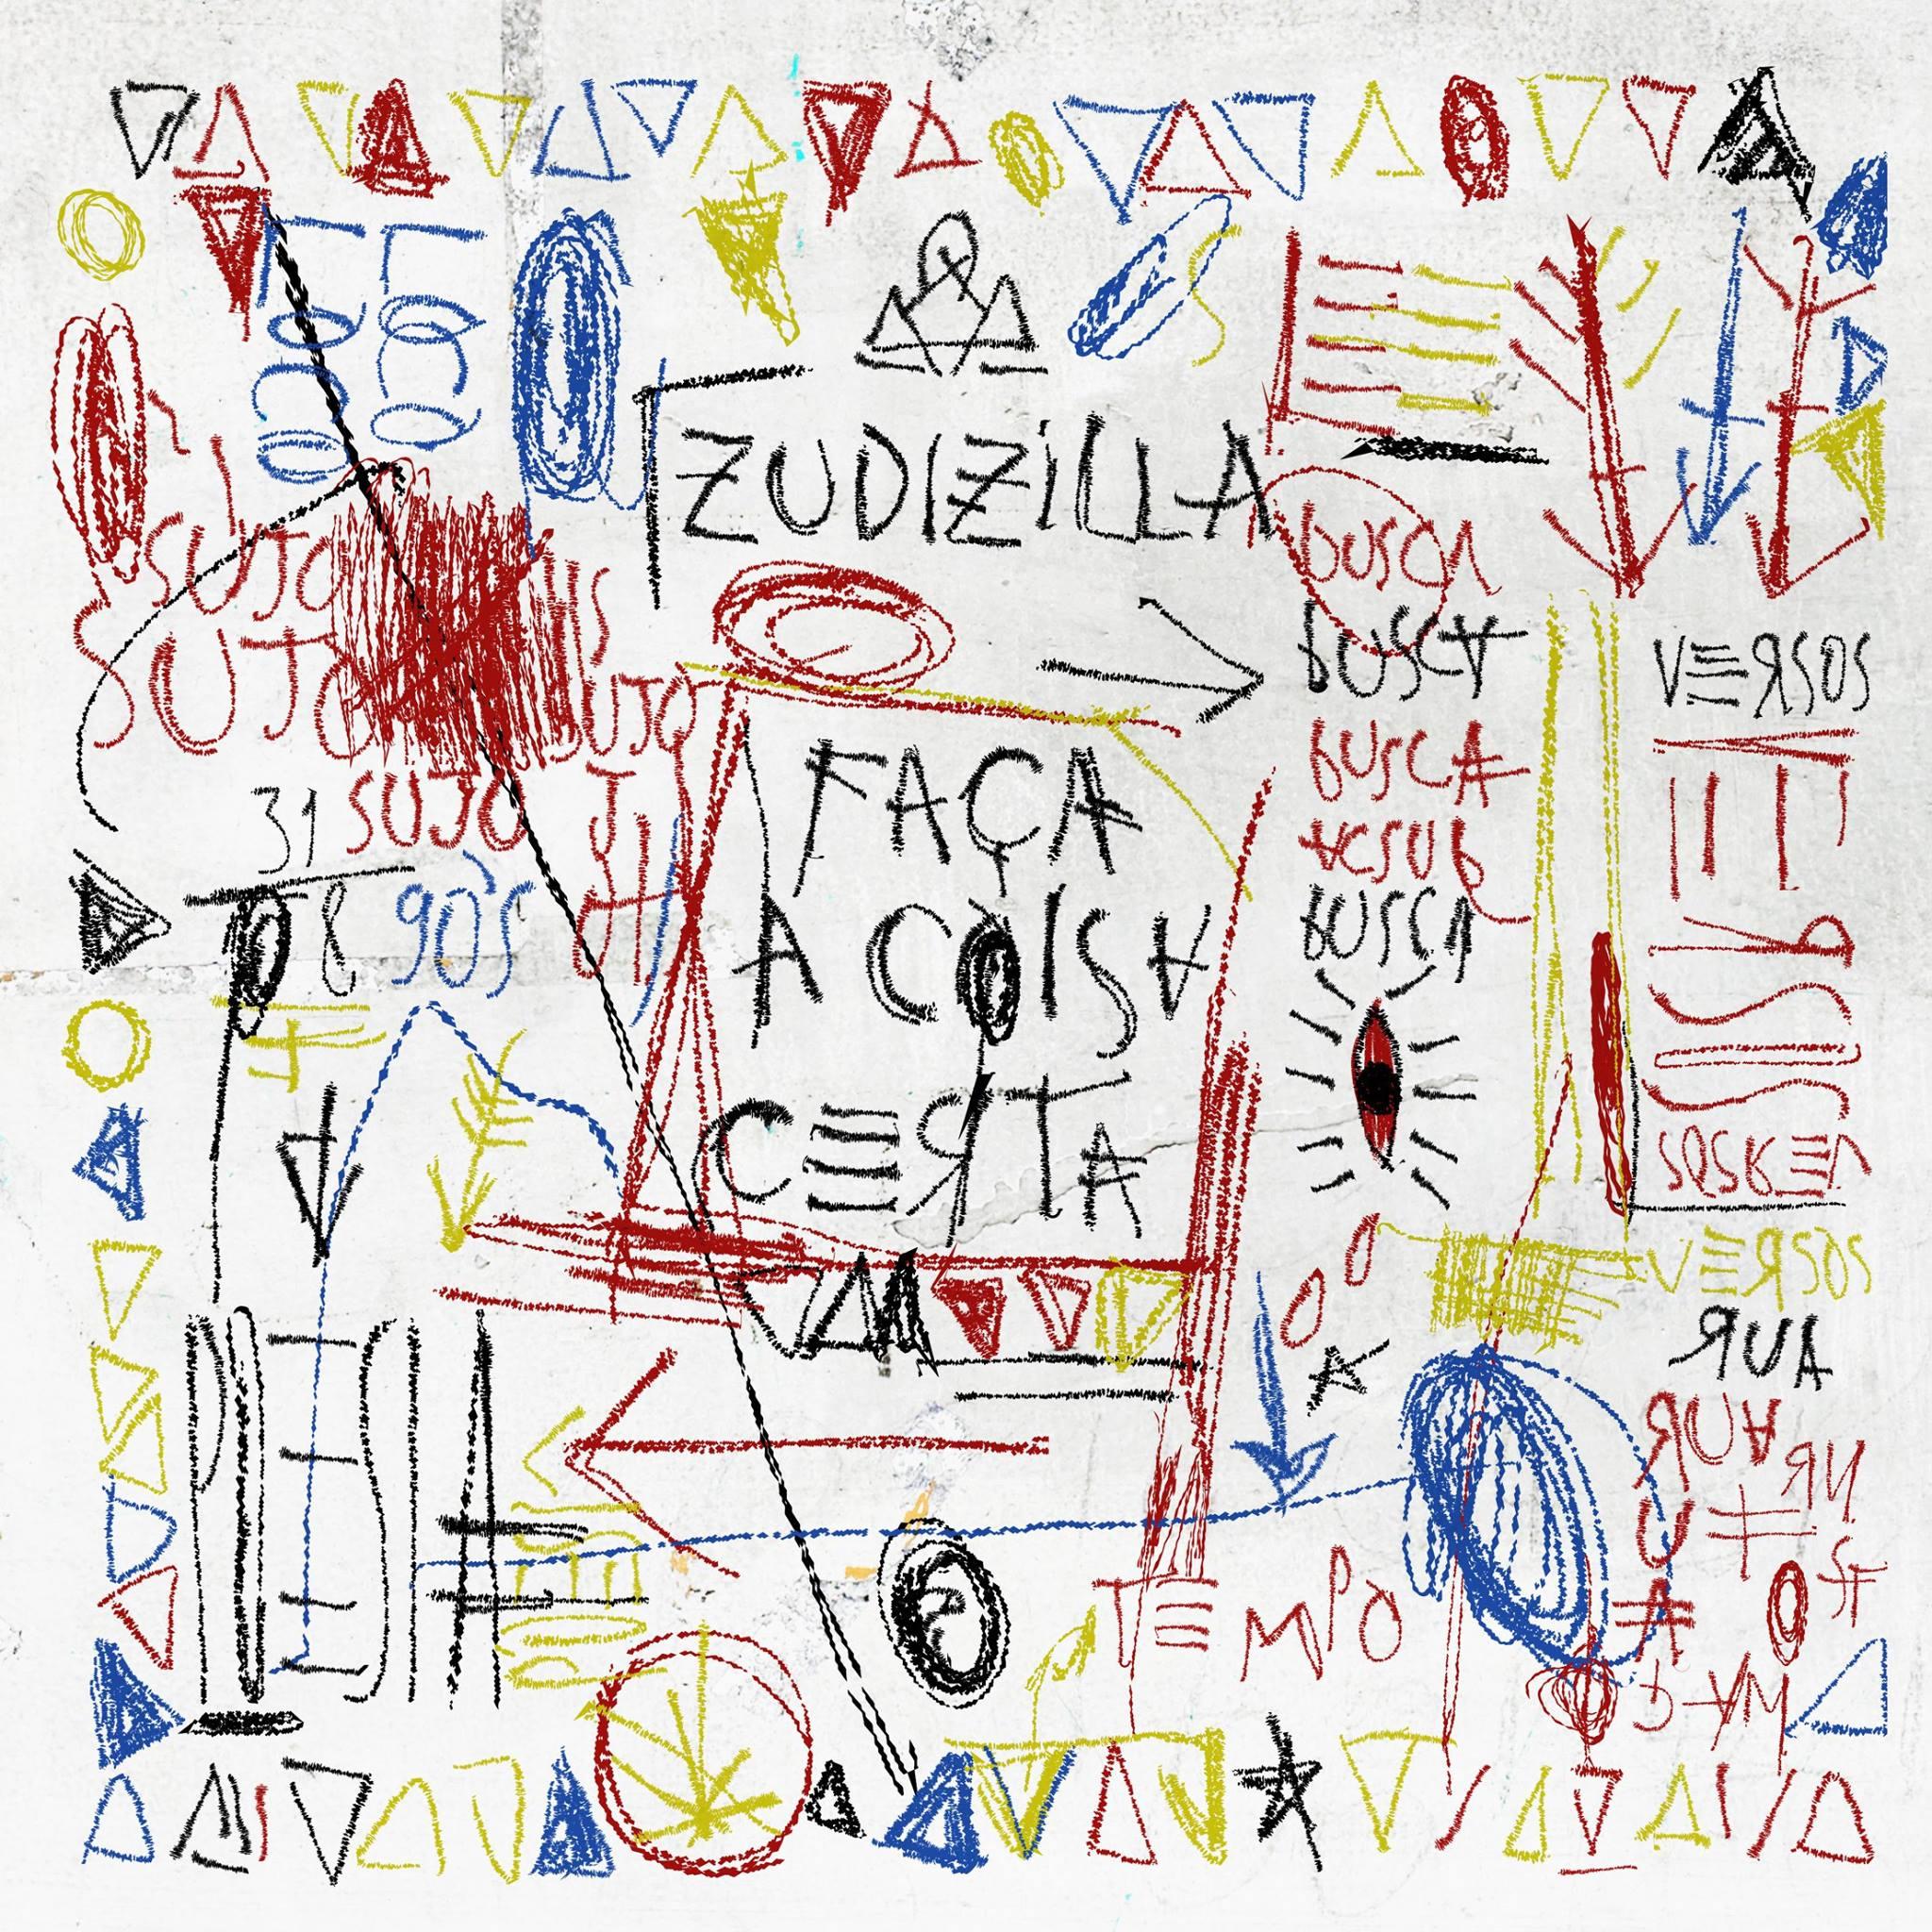 Cover Zudizilla - Amor (Brésil)